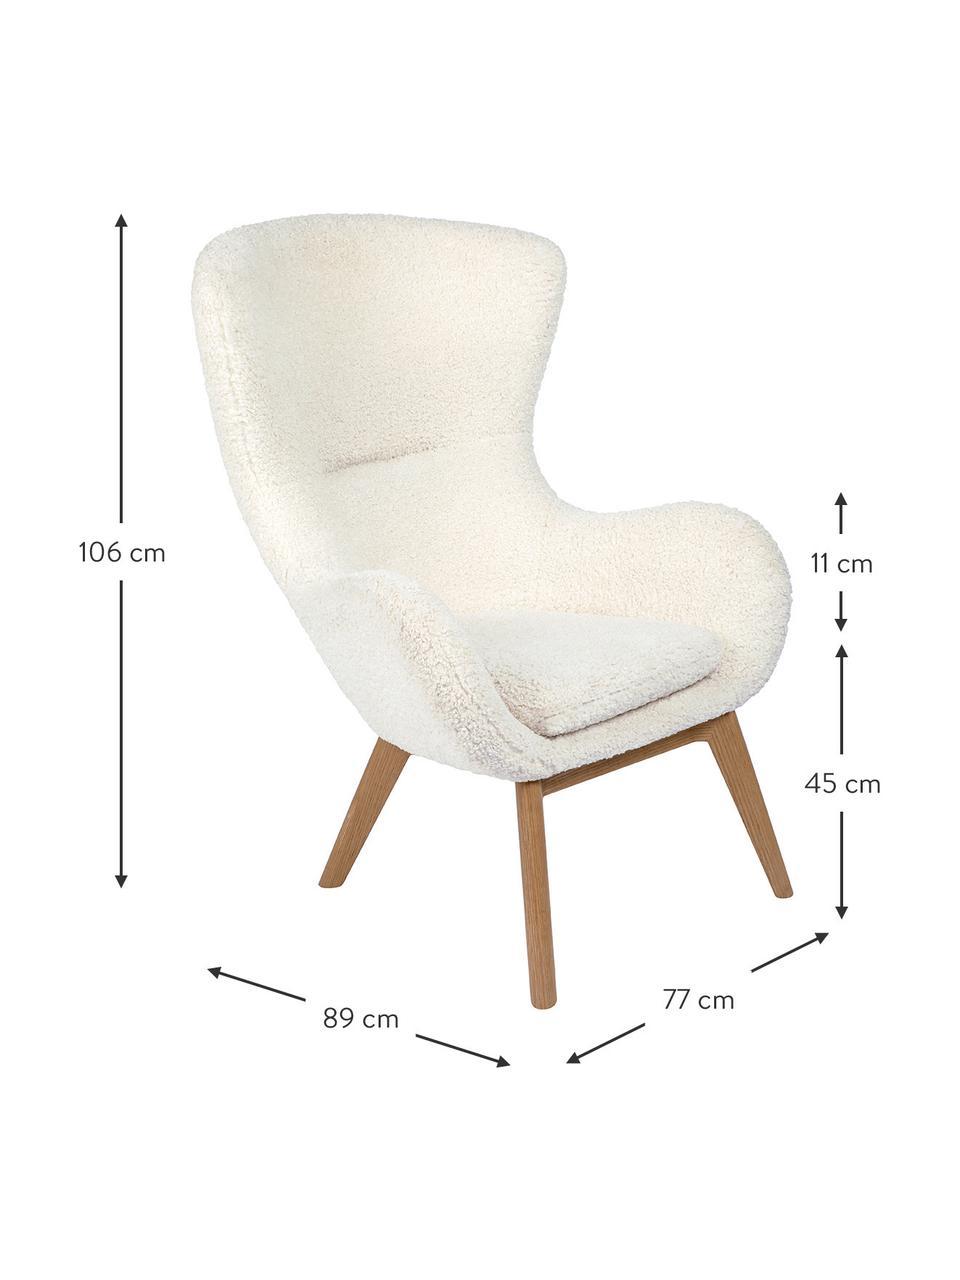 Teddy fauteuil Wing in crèmewit met houten poten, Bekleding: polyester (teddyvacht), Poten: gelakt massief hout met e, Crèmewit, B 77 x D 89 cm